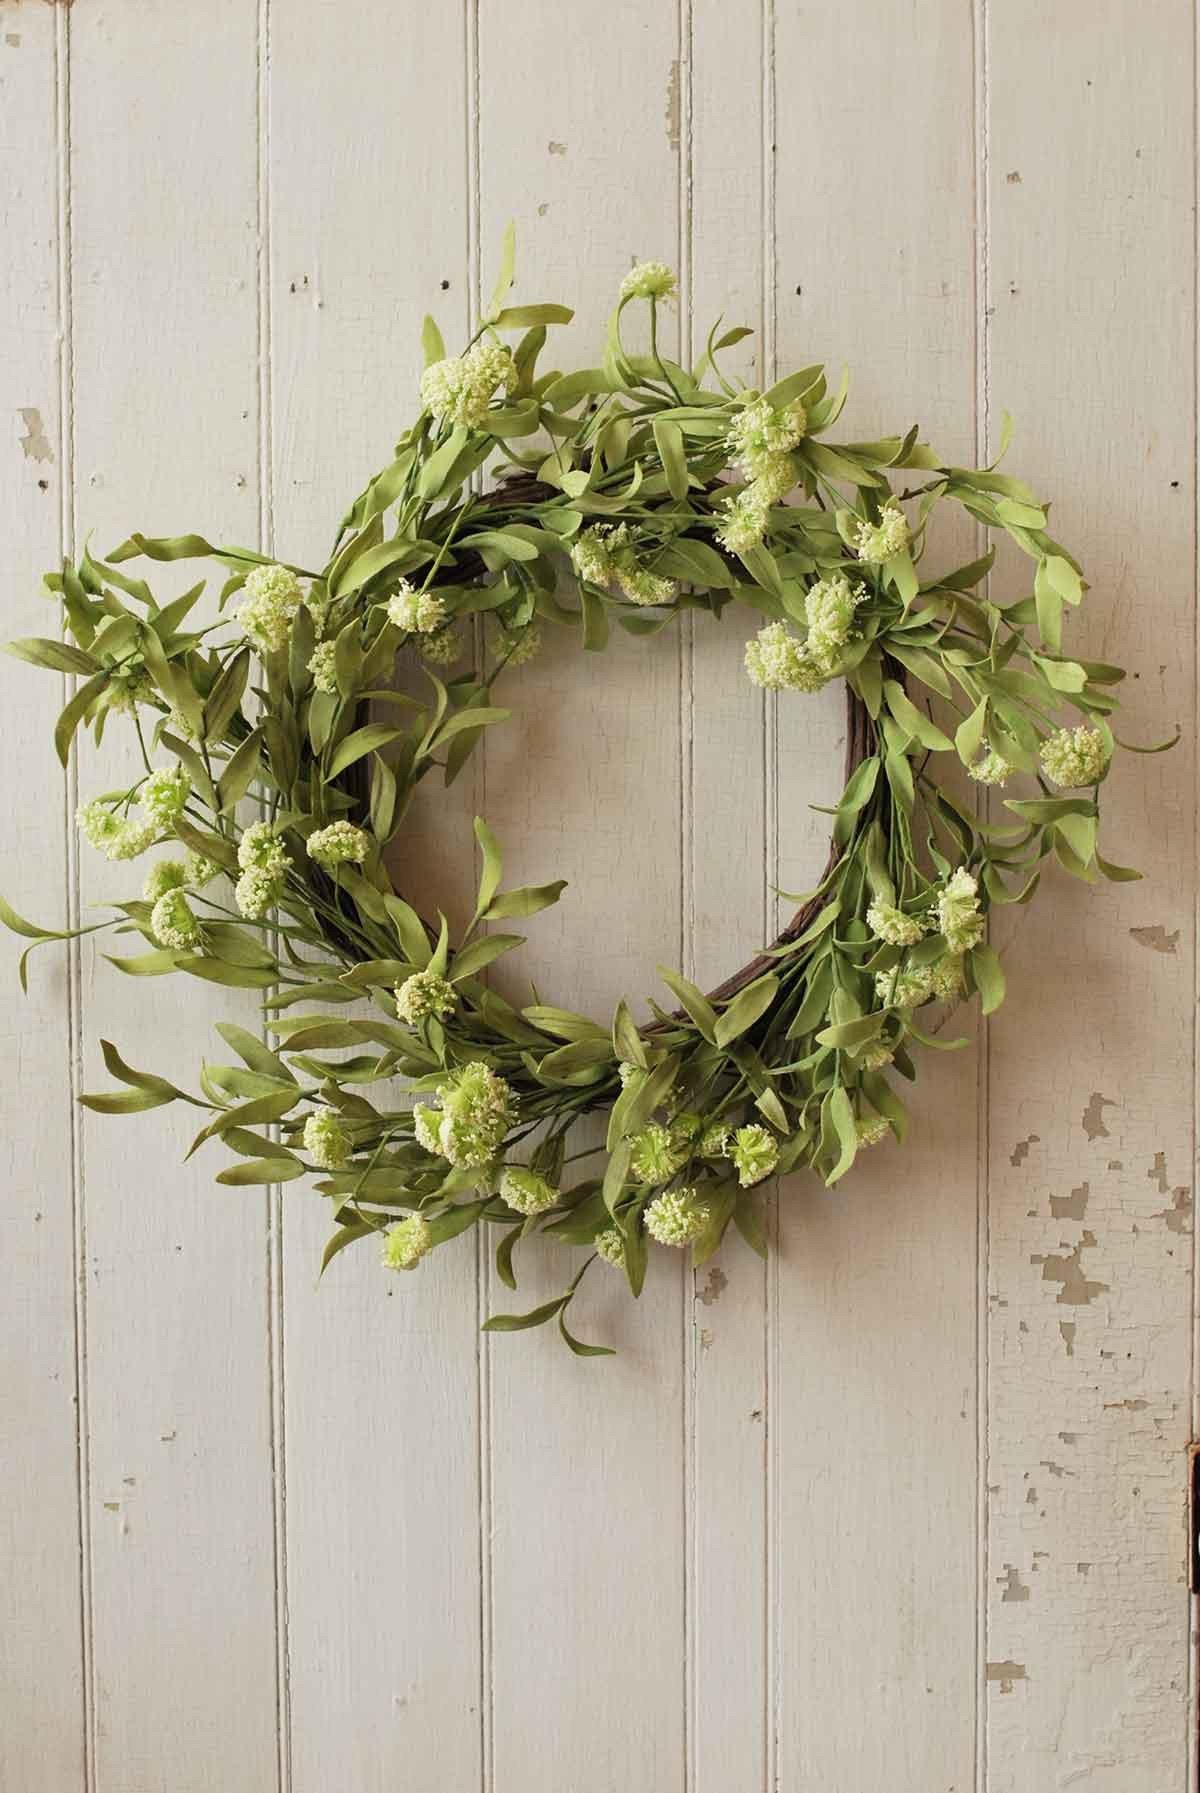 Dill Wreath, $29.99